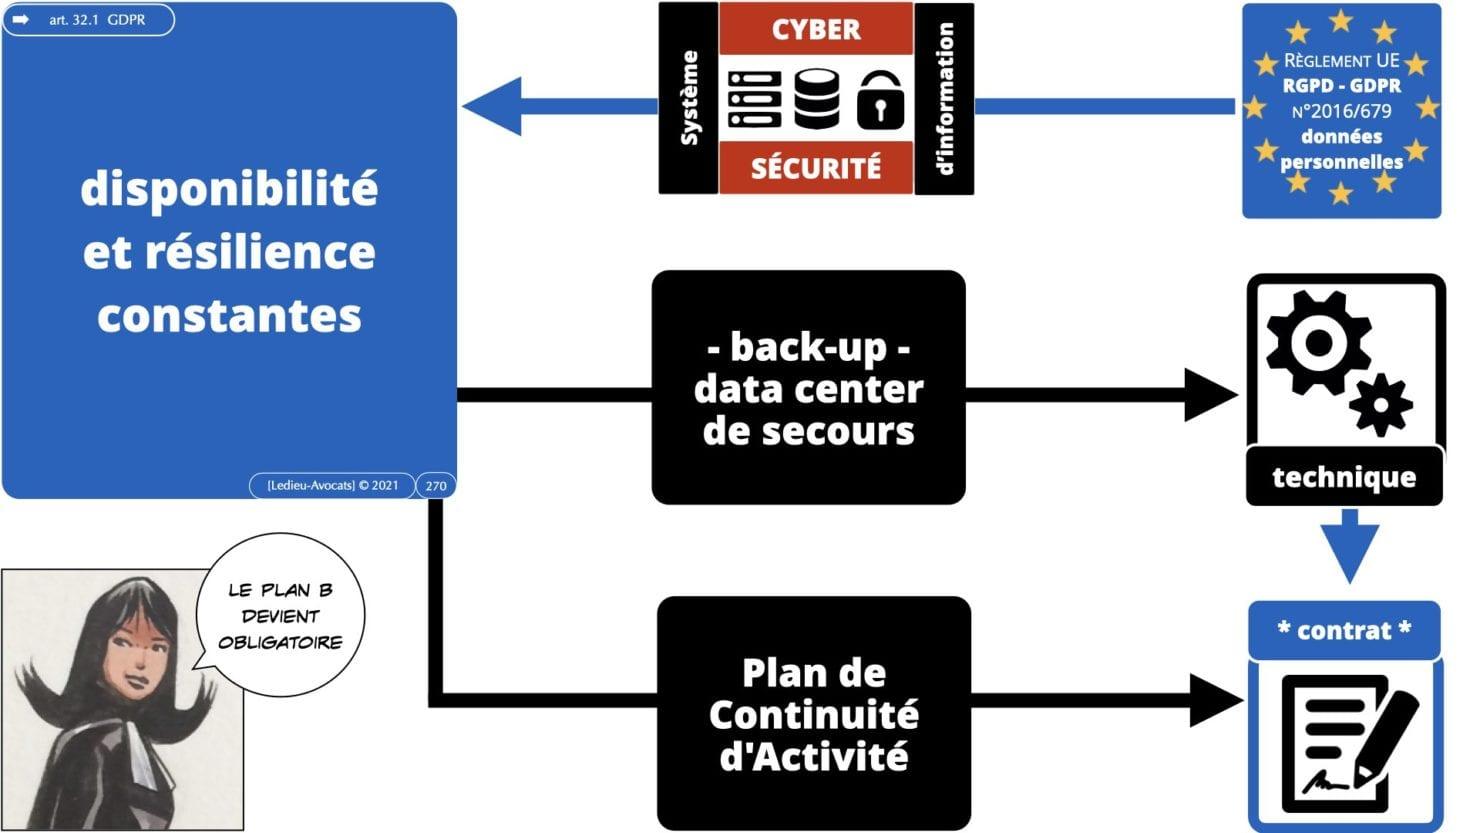 RGPD e-Privacy principes actualité jurisprudence ©Ledieu-Avocats 25-06-2021.270